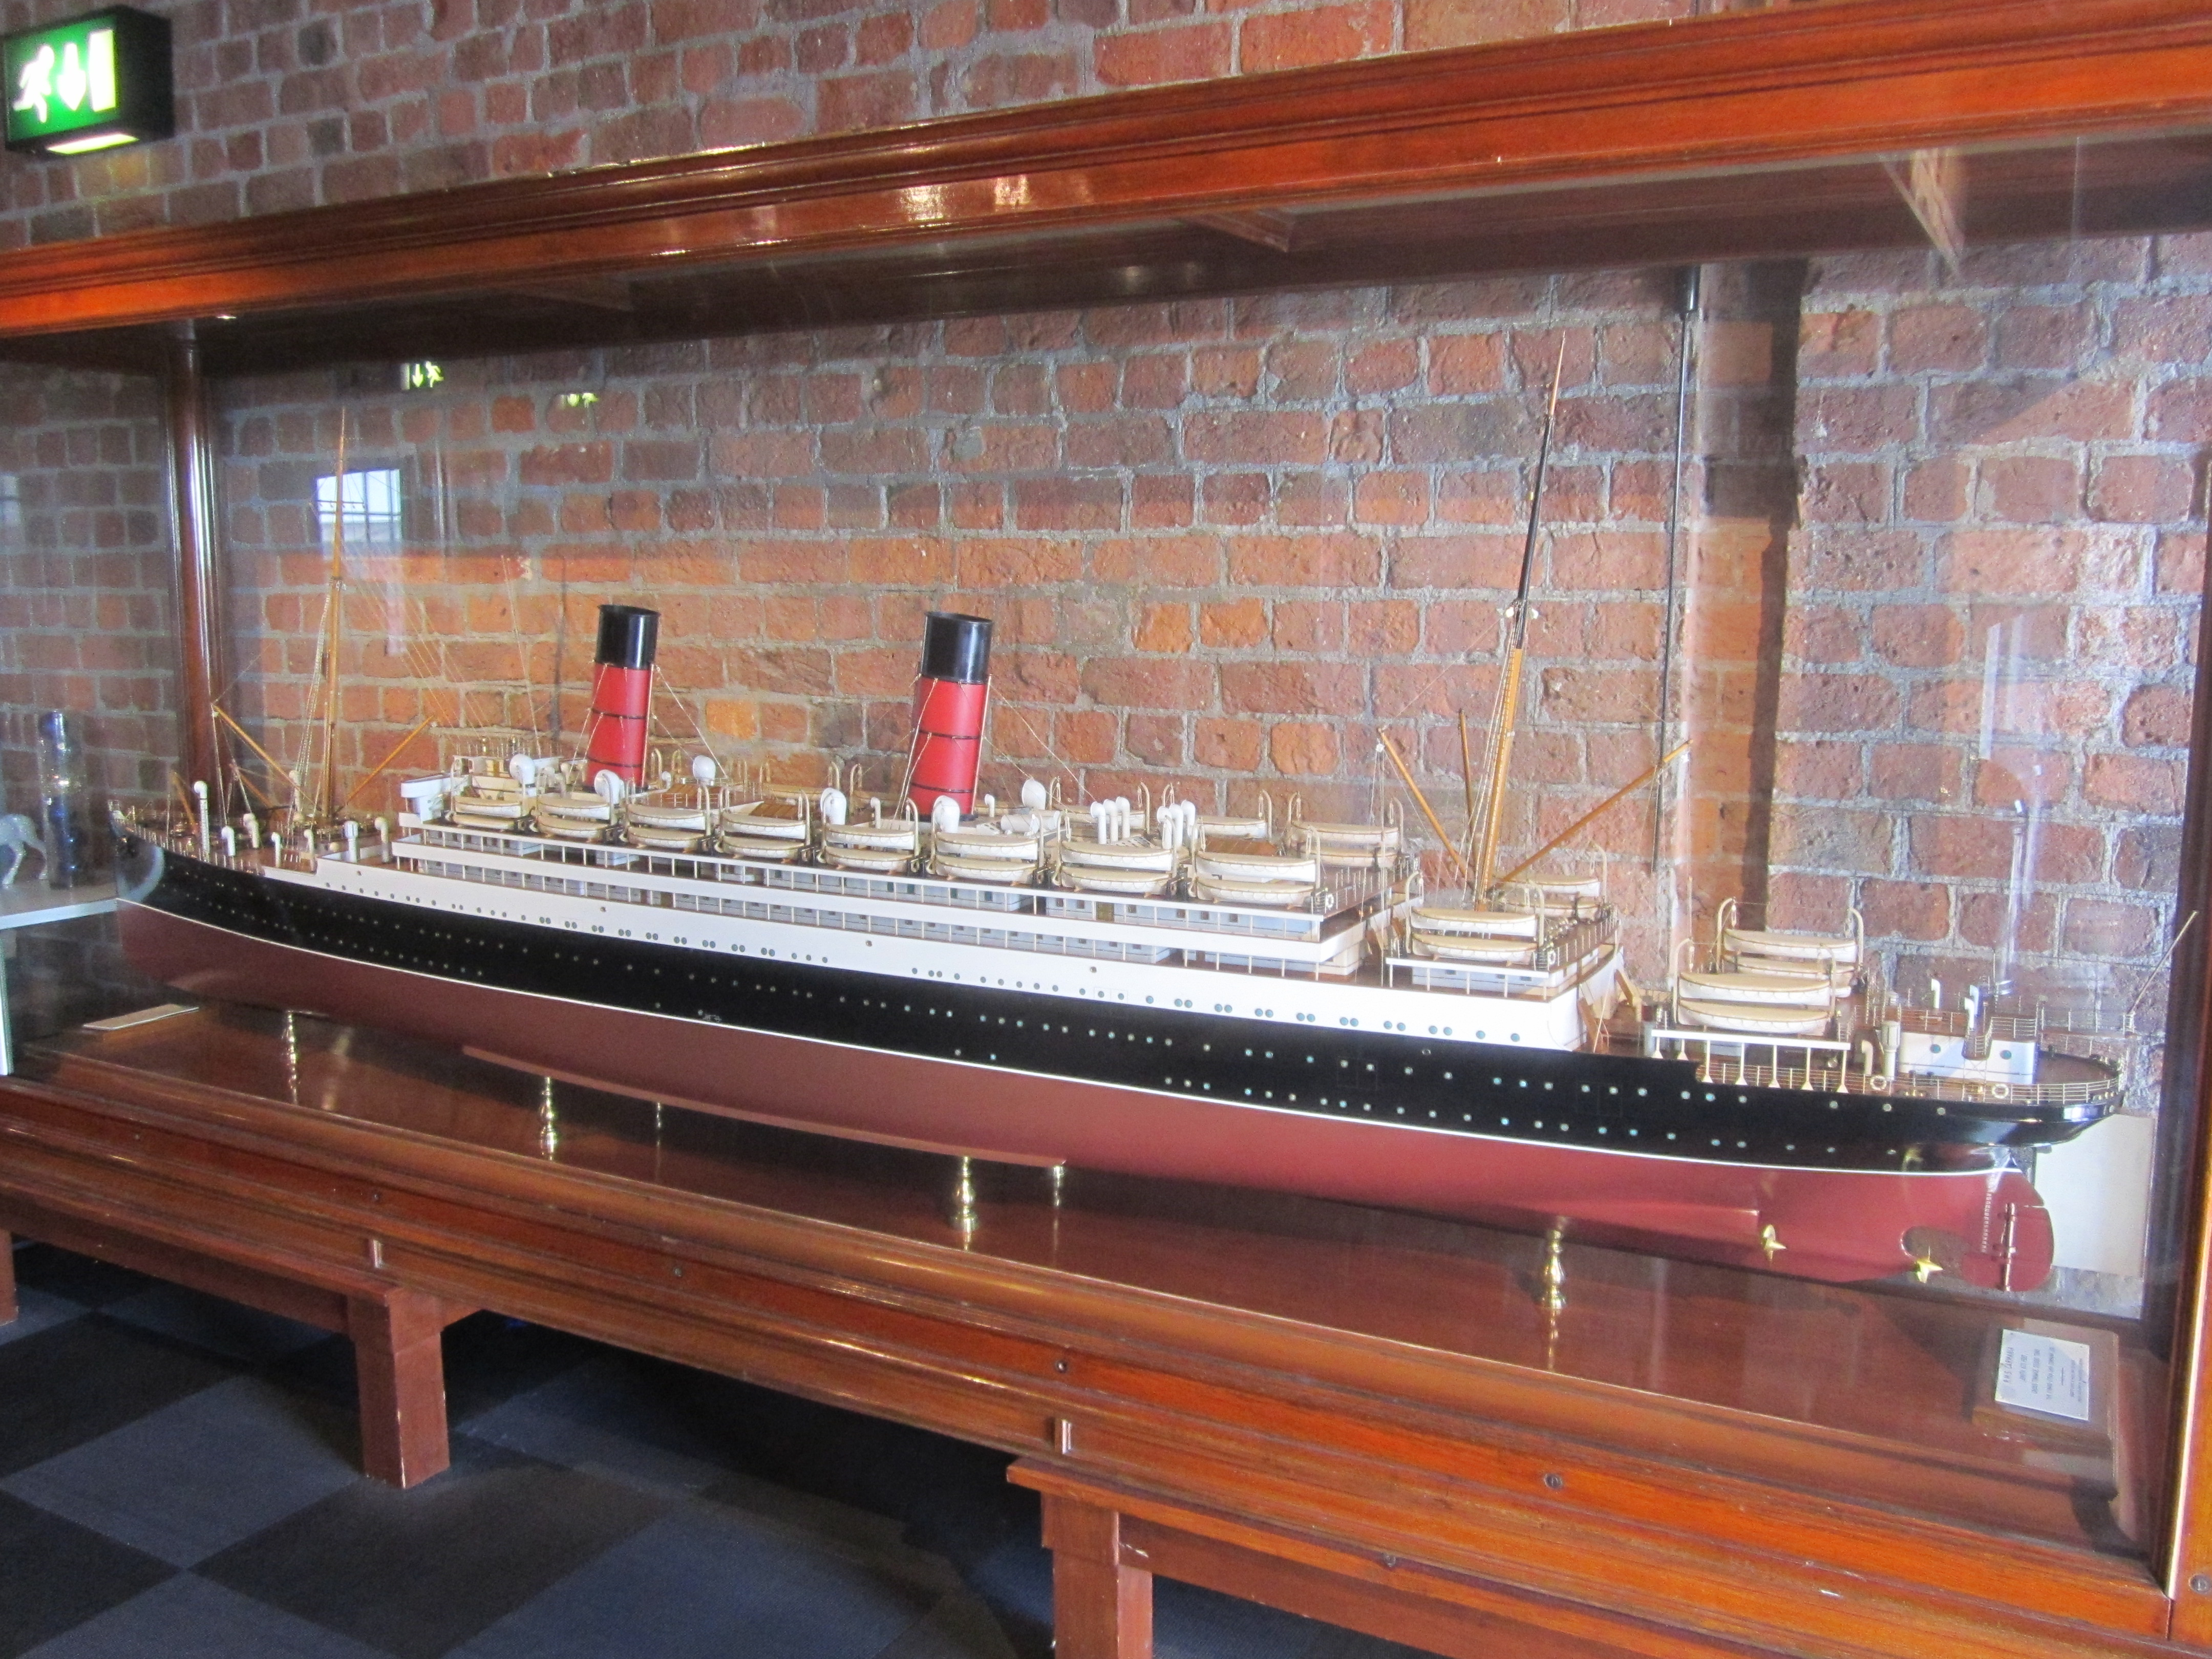 Ship A Car >> File:Model of Carmania (ship, 1905), Merseyside Maritime Museum.JPG - Wikimedia Commons